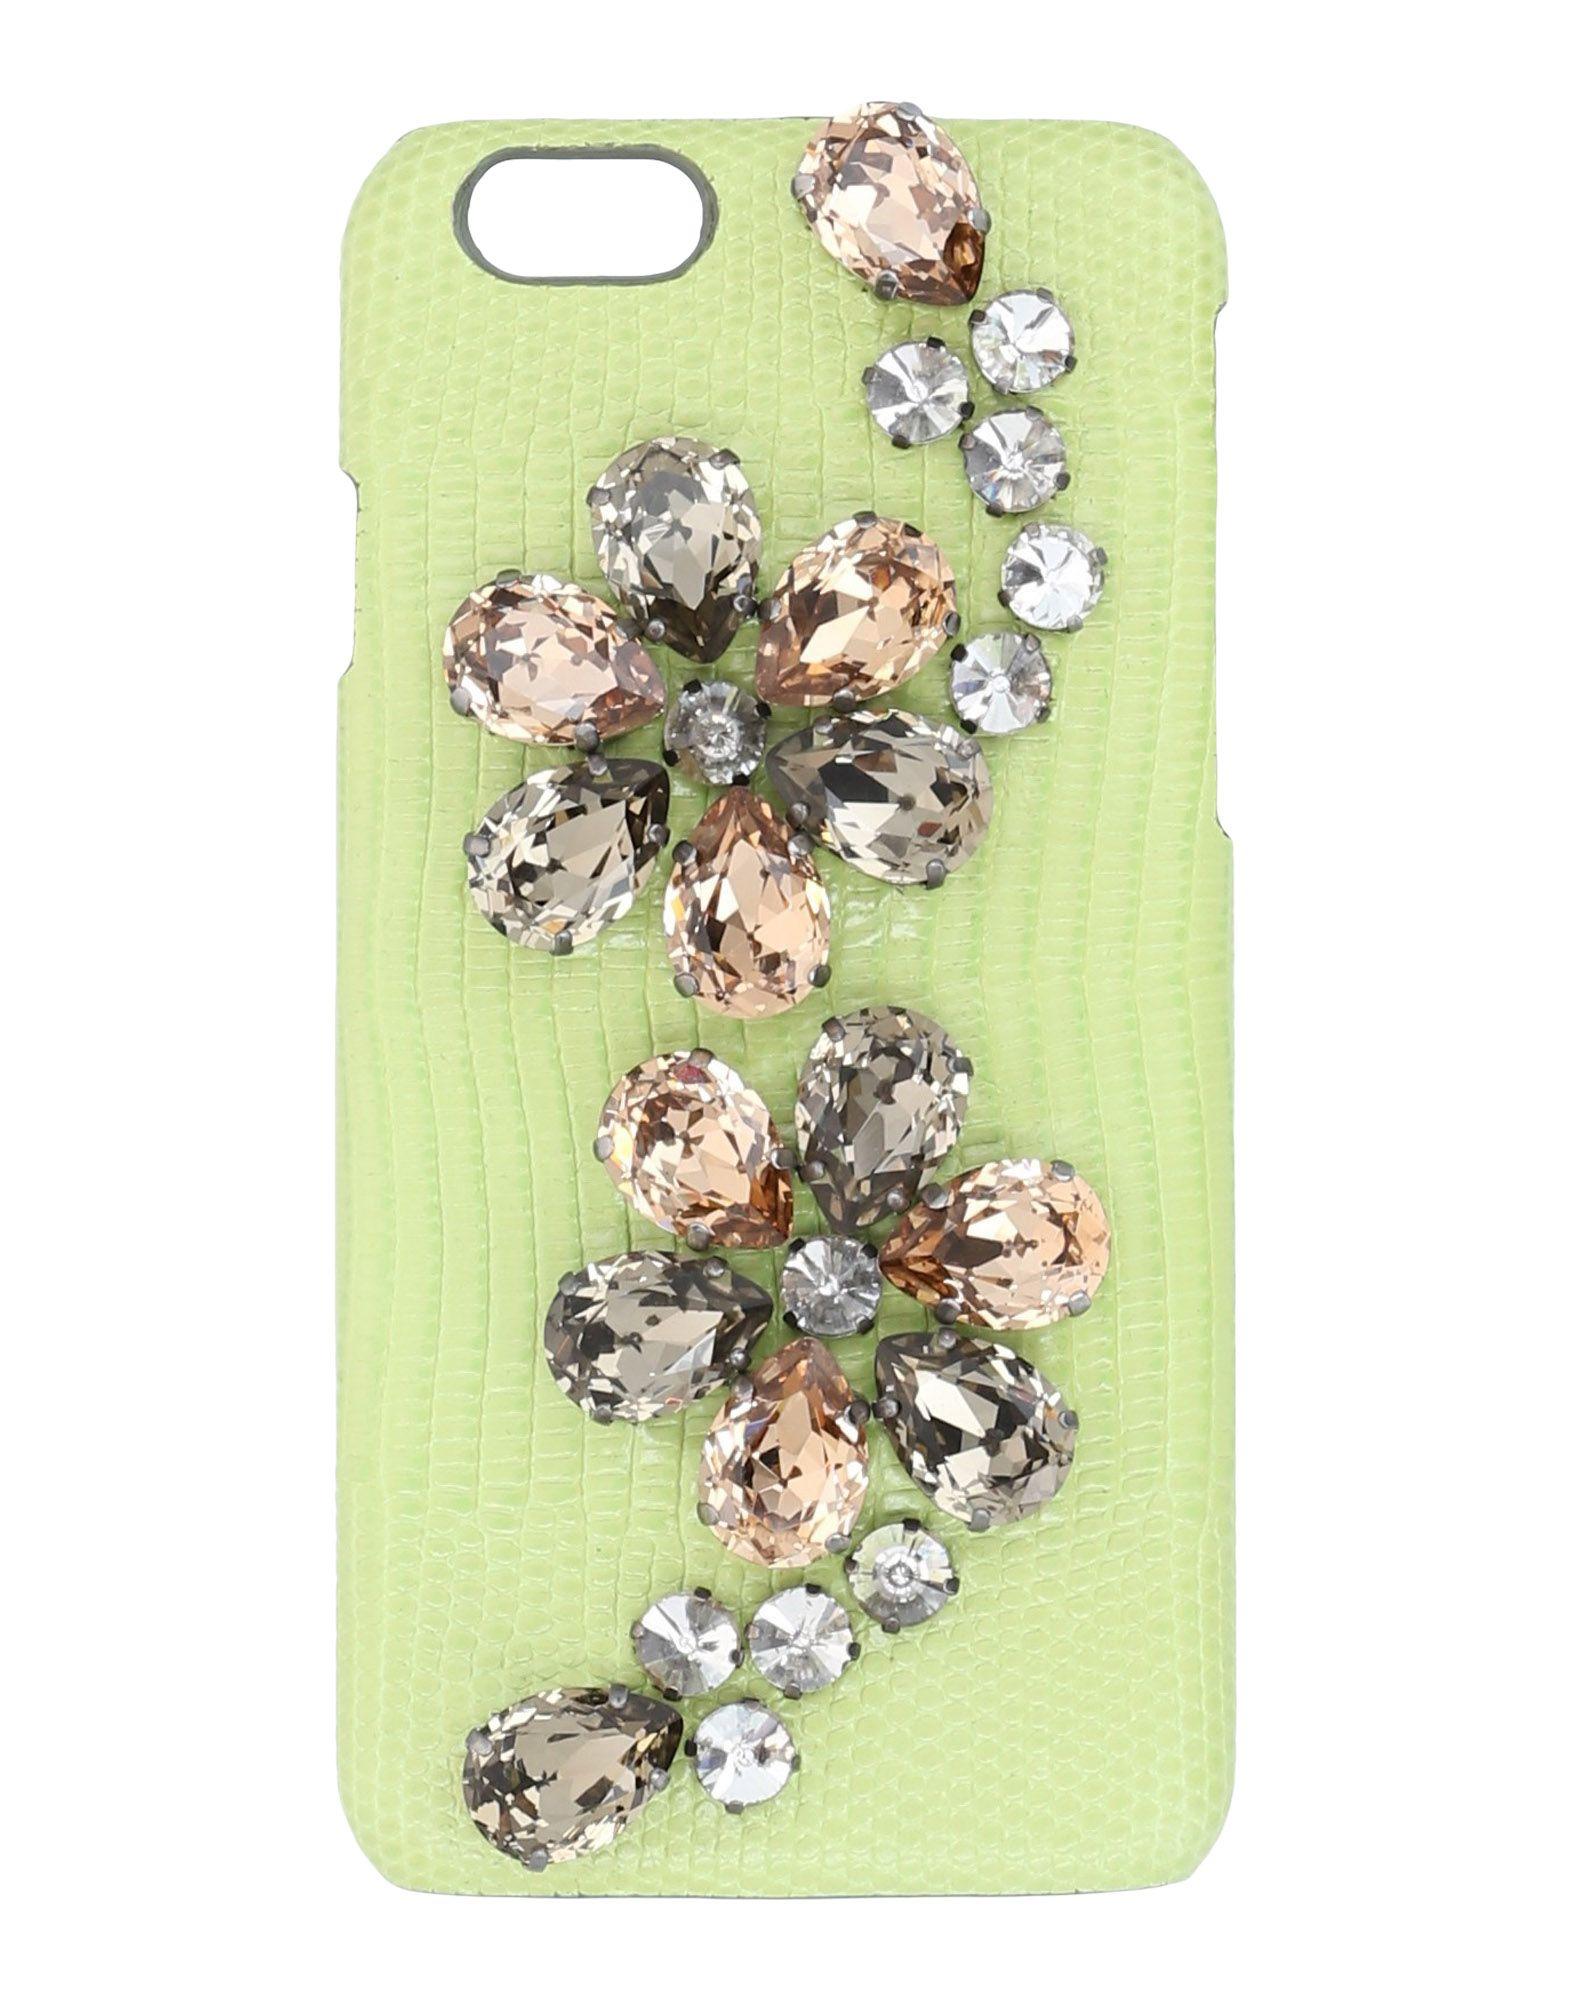 DOLCE & GABBANA Чехол чехол накладка для iphone 5 5s 6 6s 6plus 6s plus змеиный дизайн